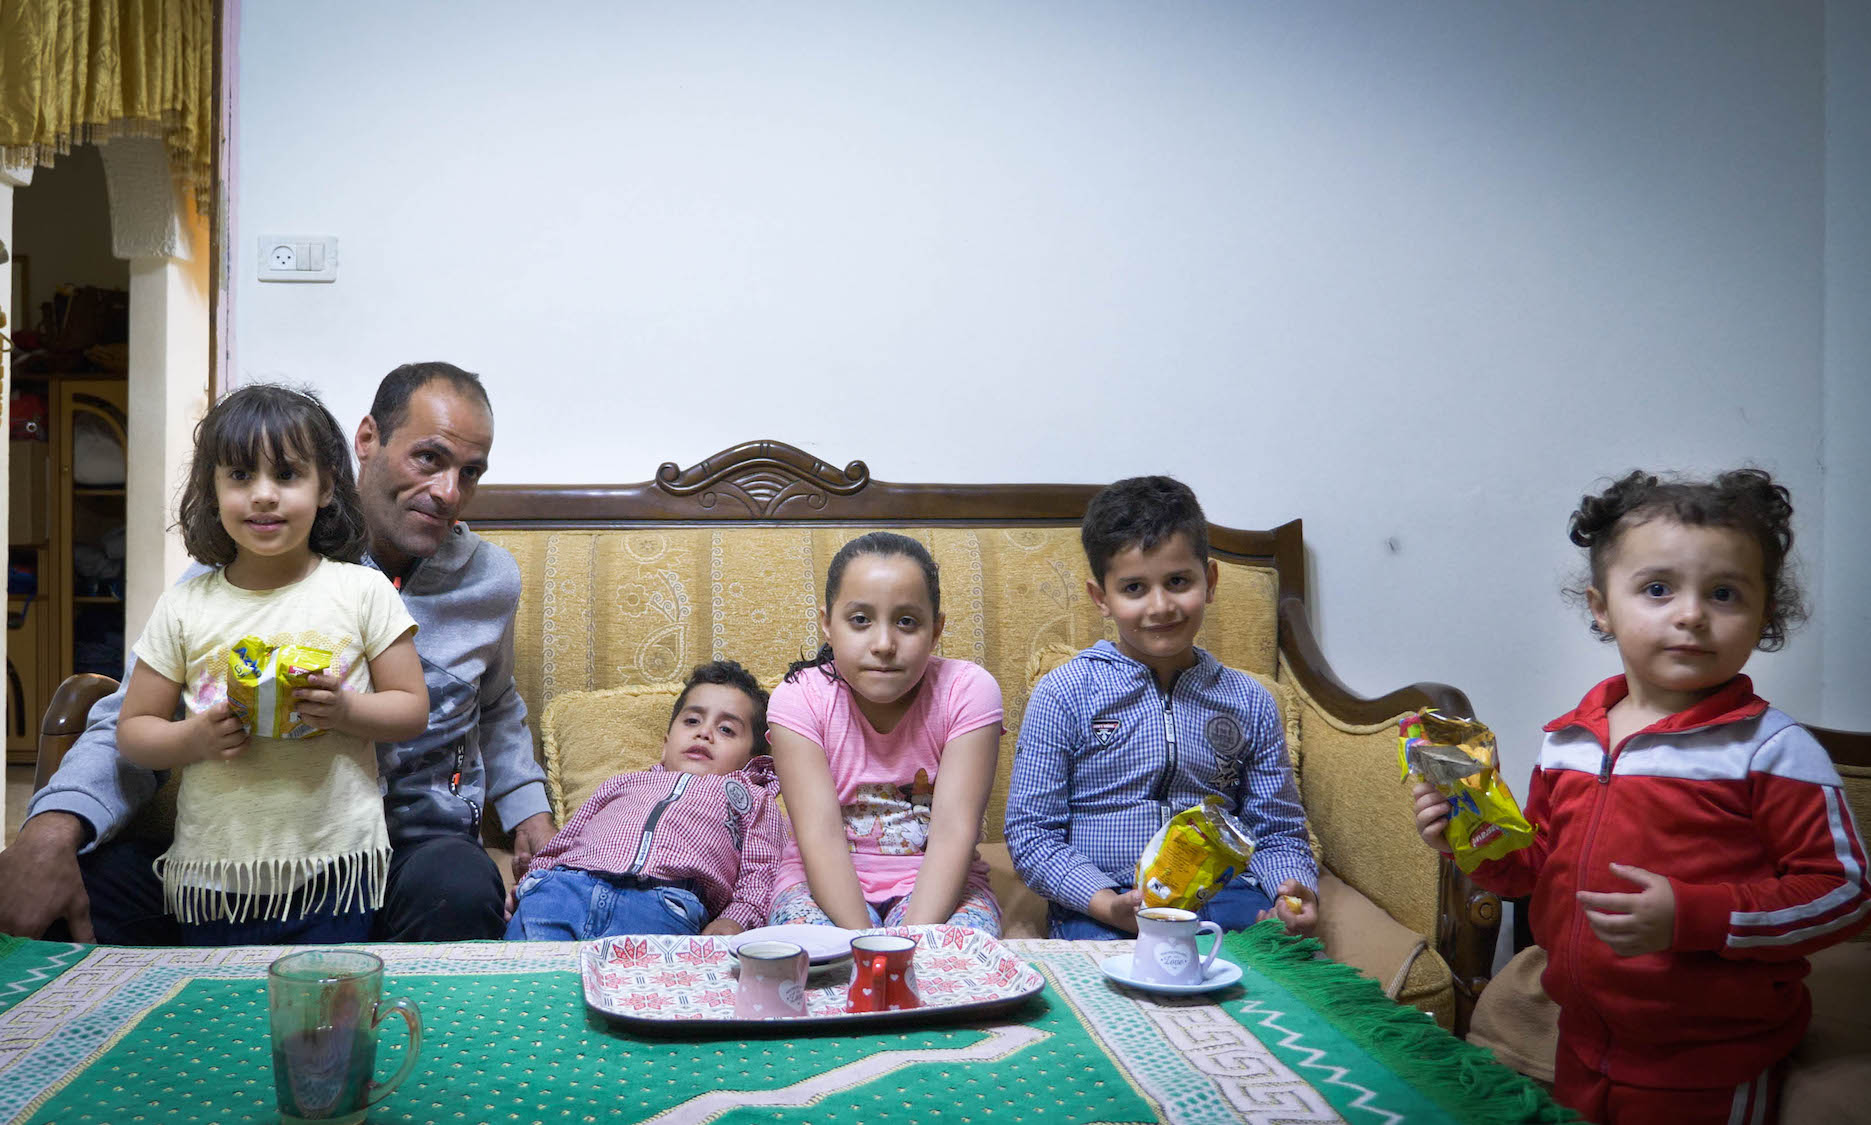 Ahmad Abu Diab and his children in their home in Silwan, East Jerusalem. (Rachel Shor)